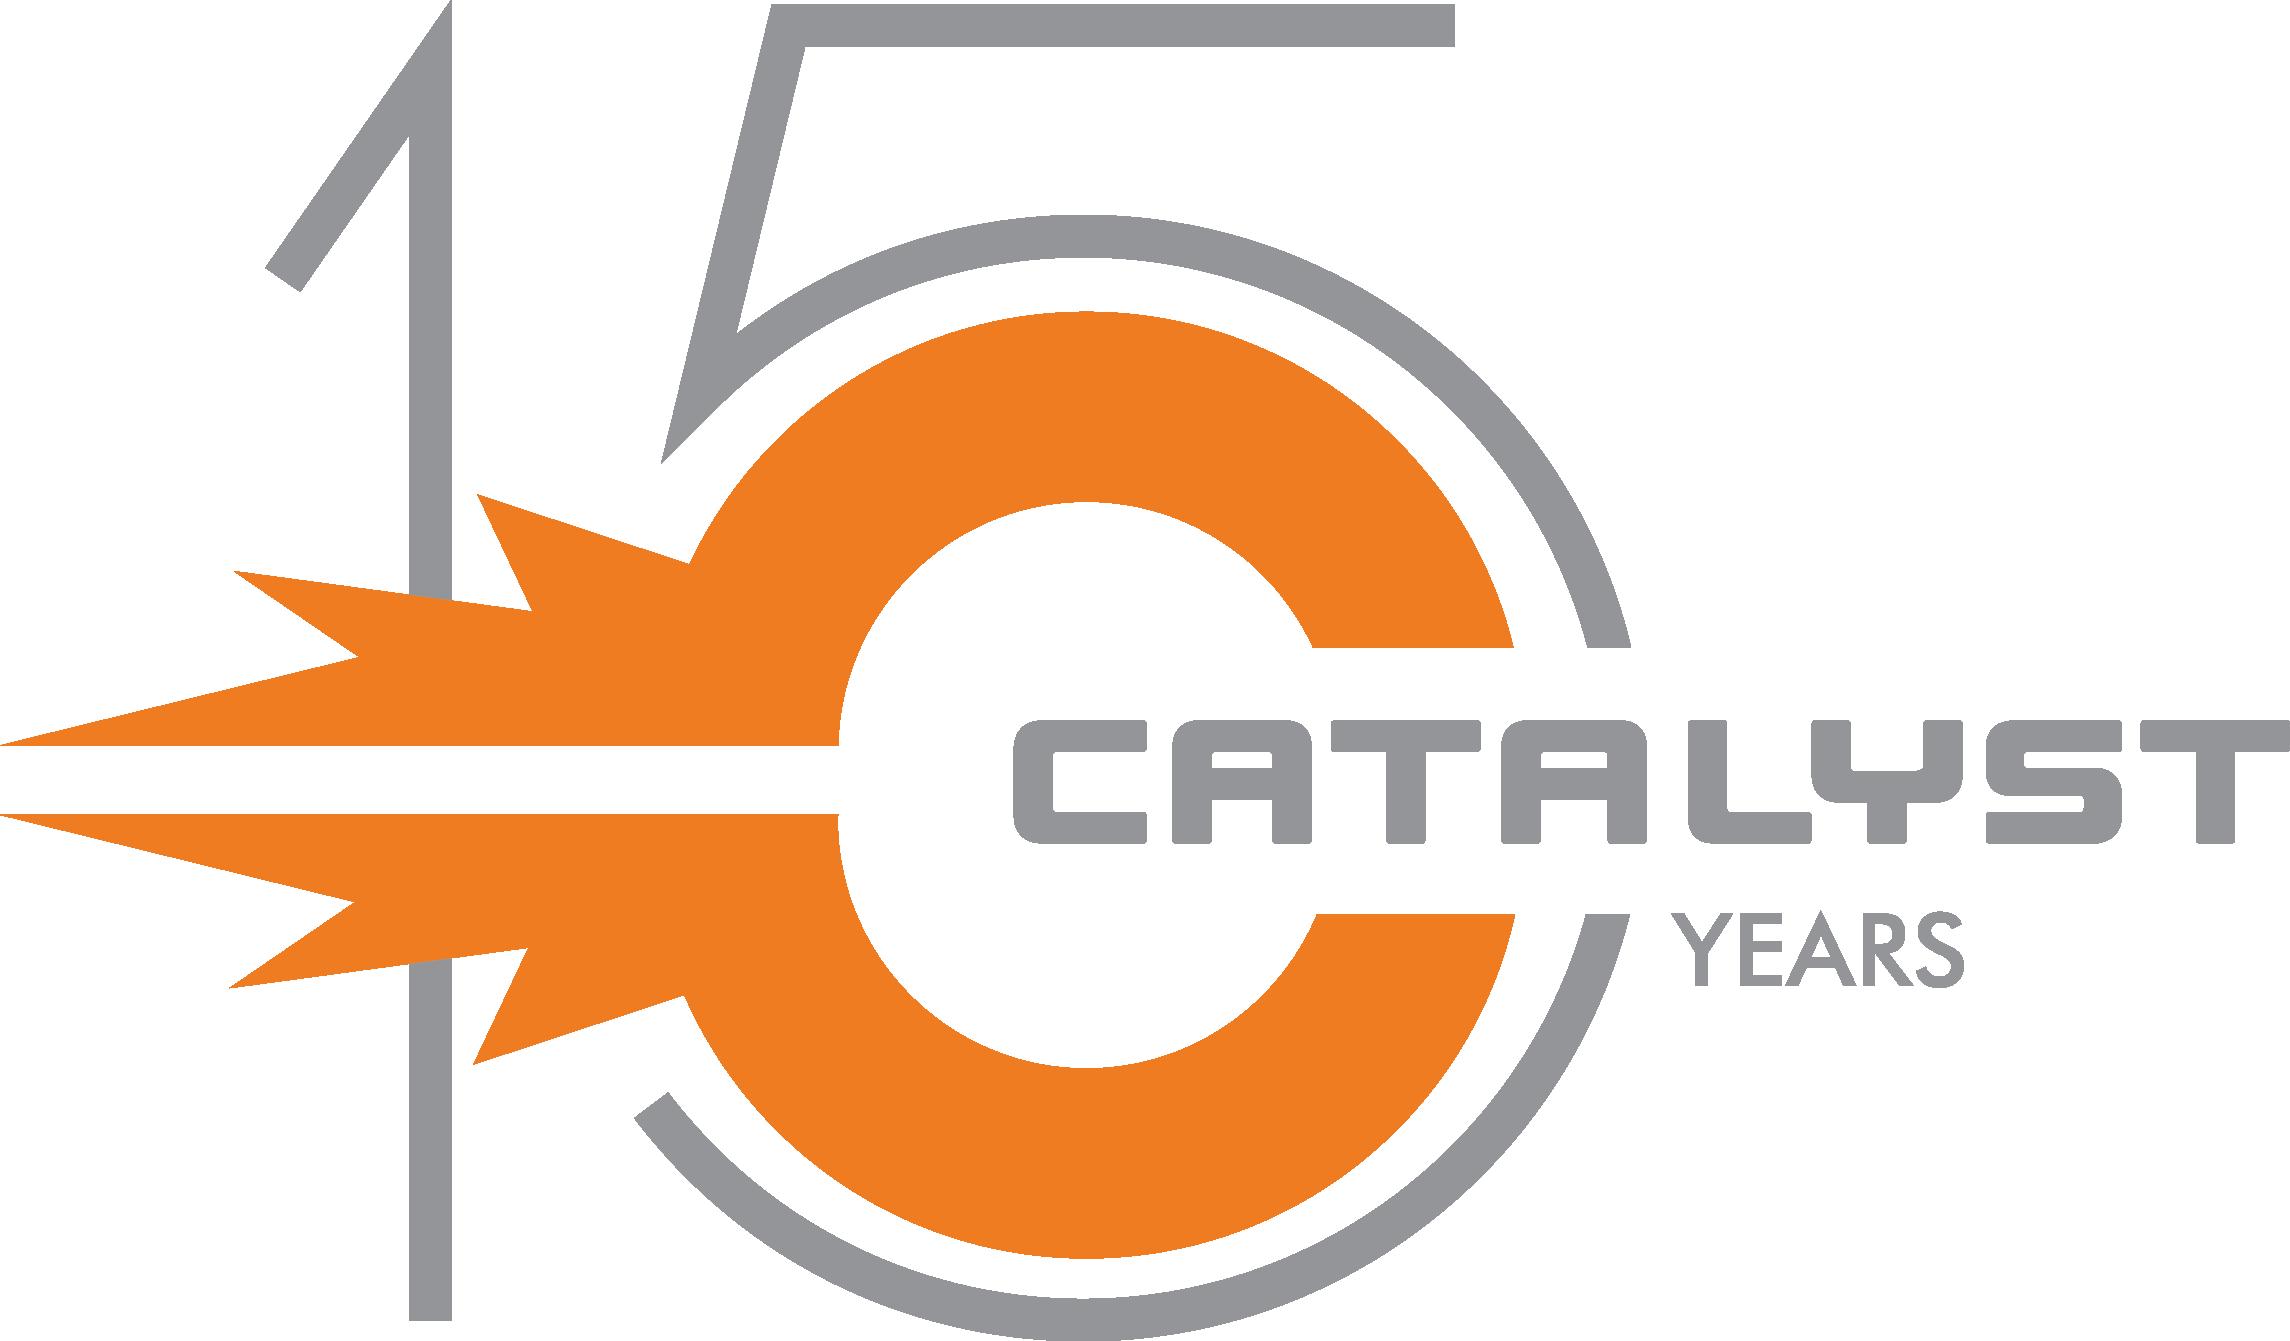 Catalyst PDG 15 years logo